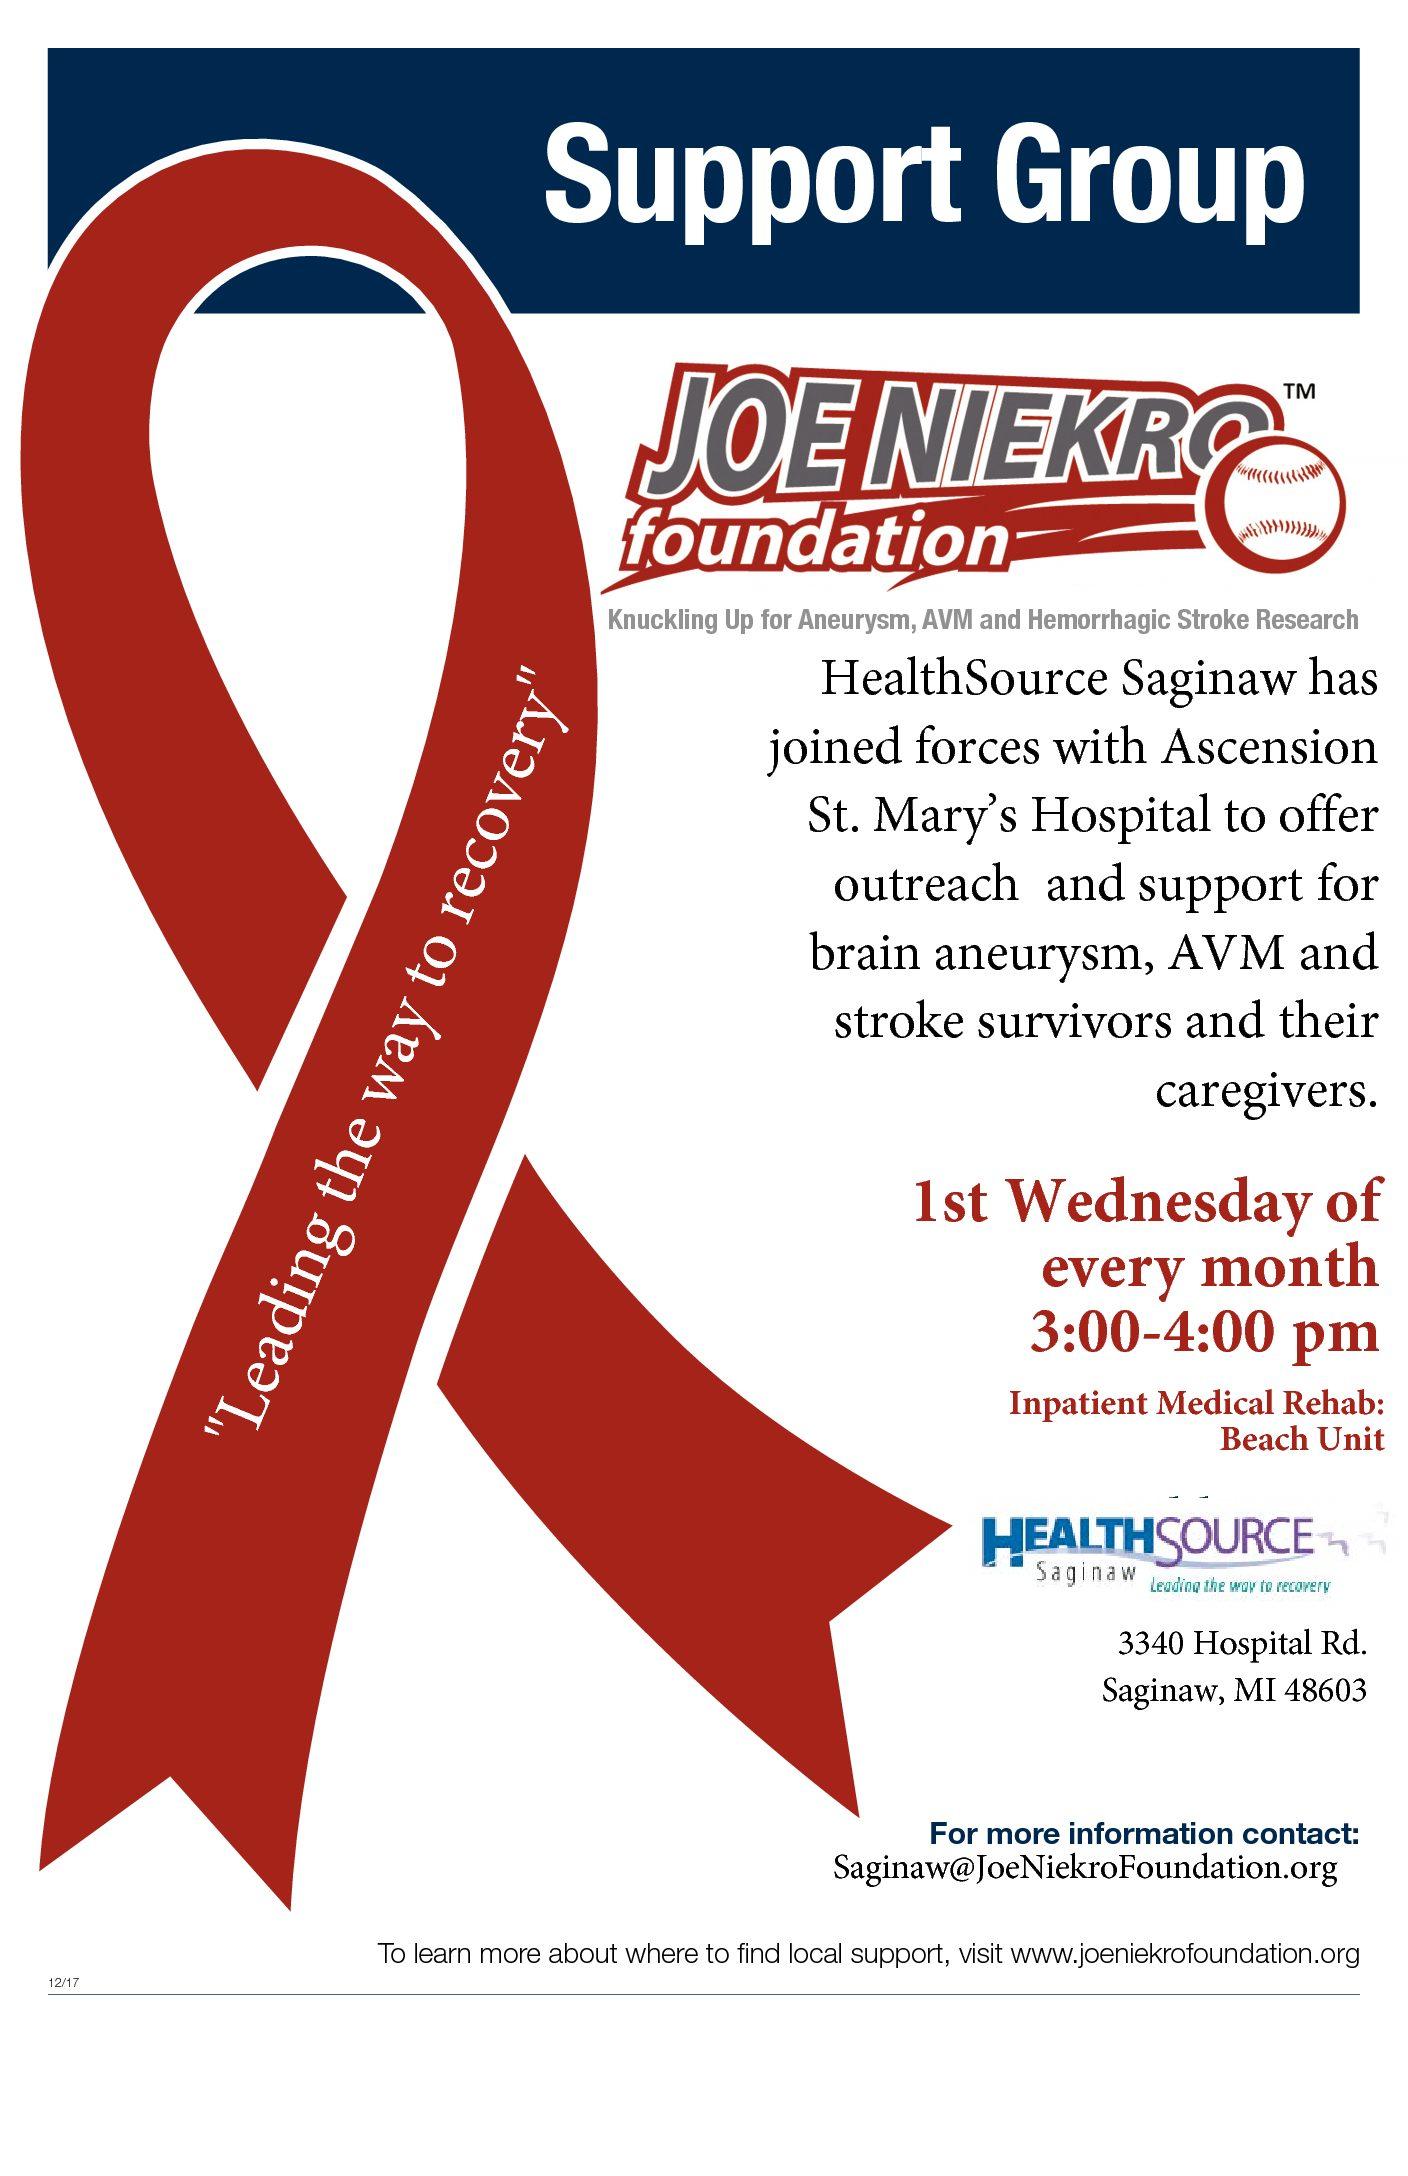 https://www.joeniekrofoundation.com/patient-caregiver-support/support-groups/locations/attachment/saginaw-jnf-support-group-2/